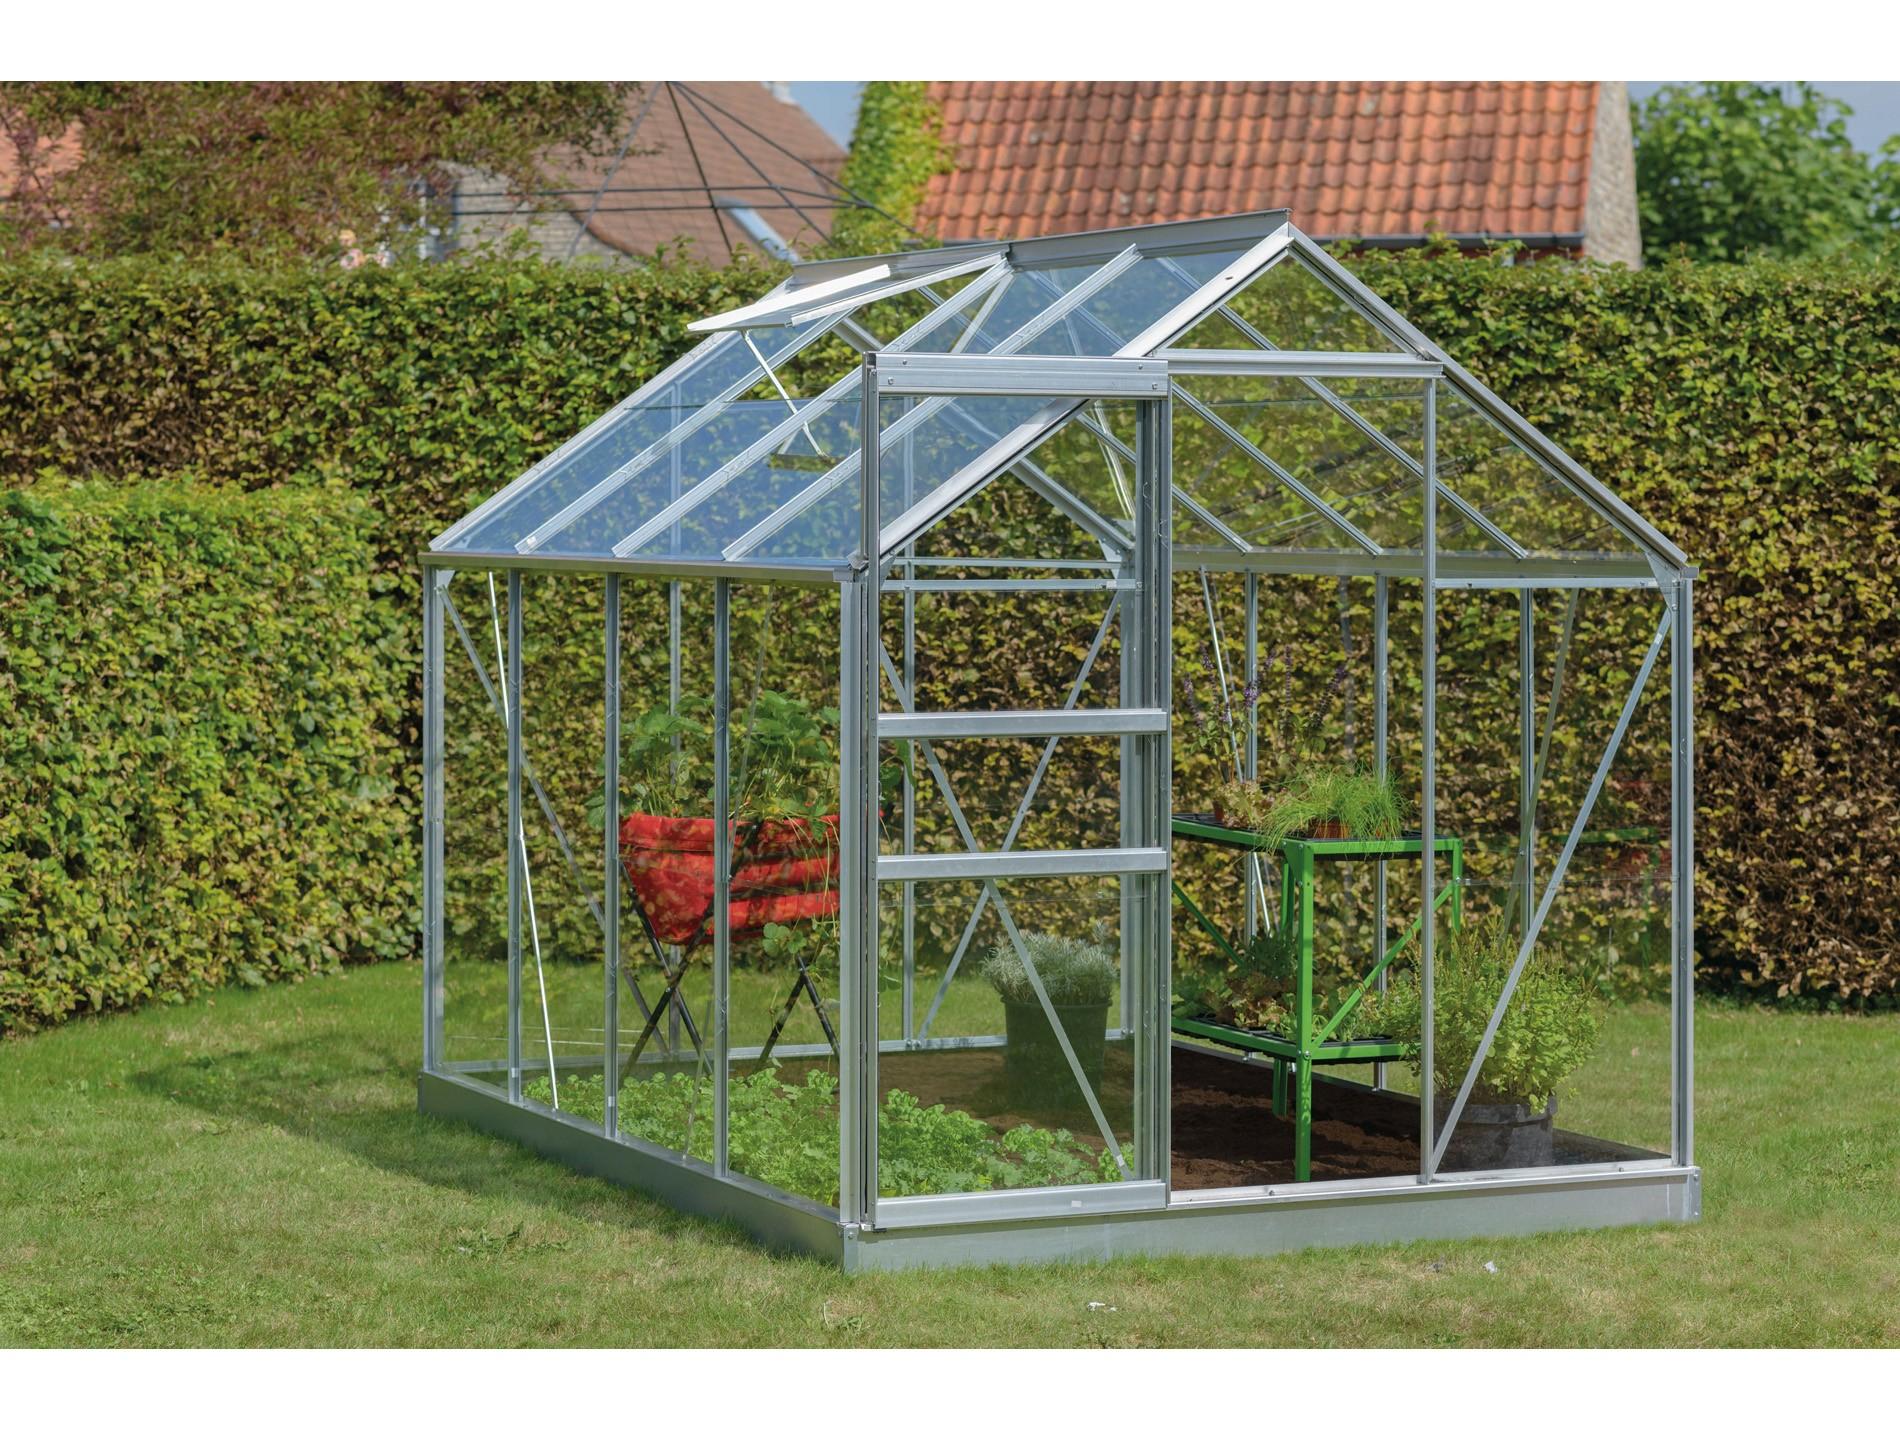 Serre Introgrow Ivy 5M² Verre Securit - Alu - Serre De ... pour Serres De Jardin En Verre